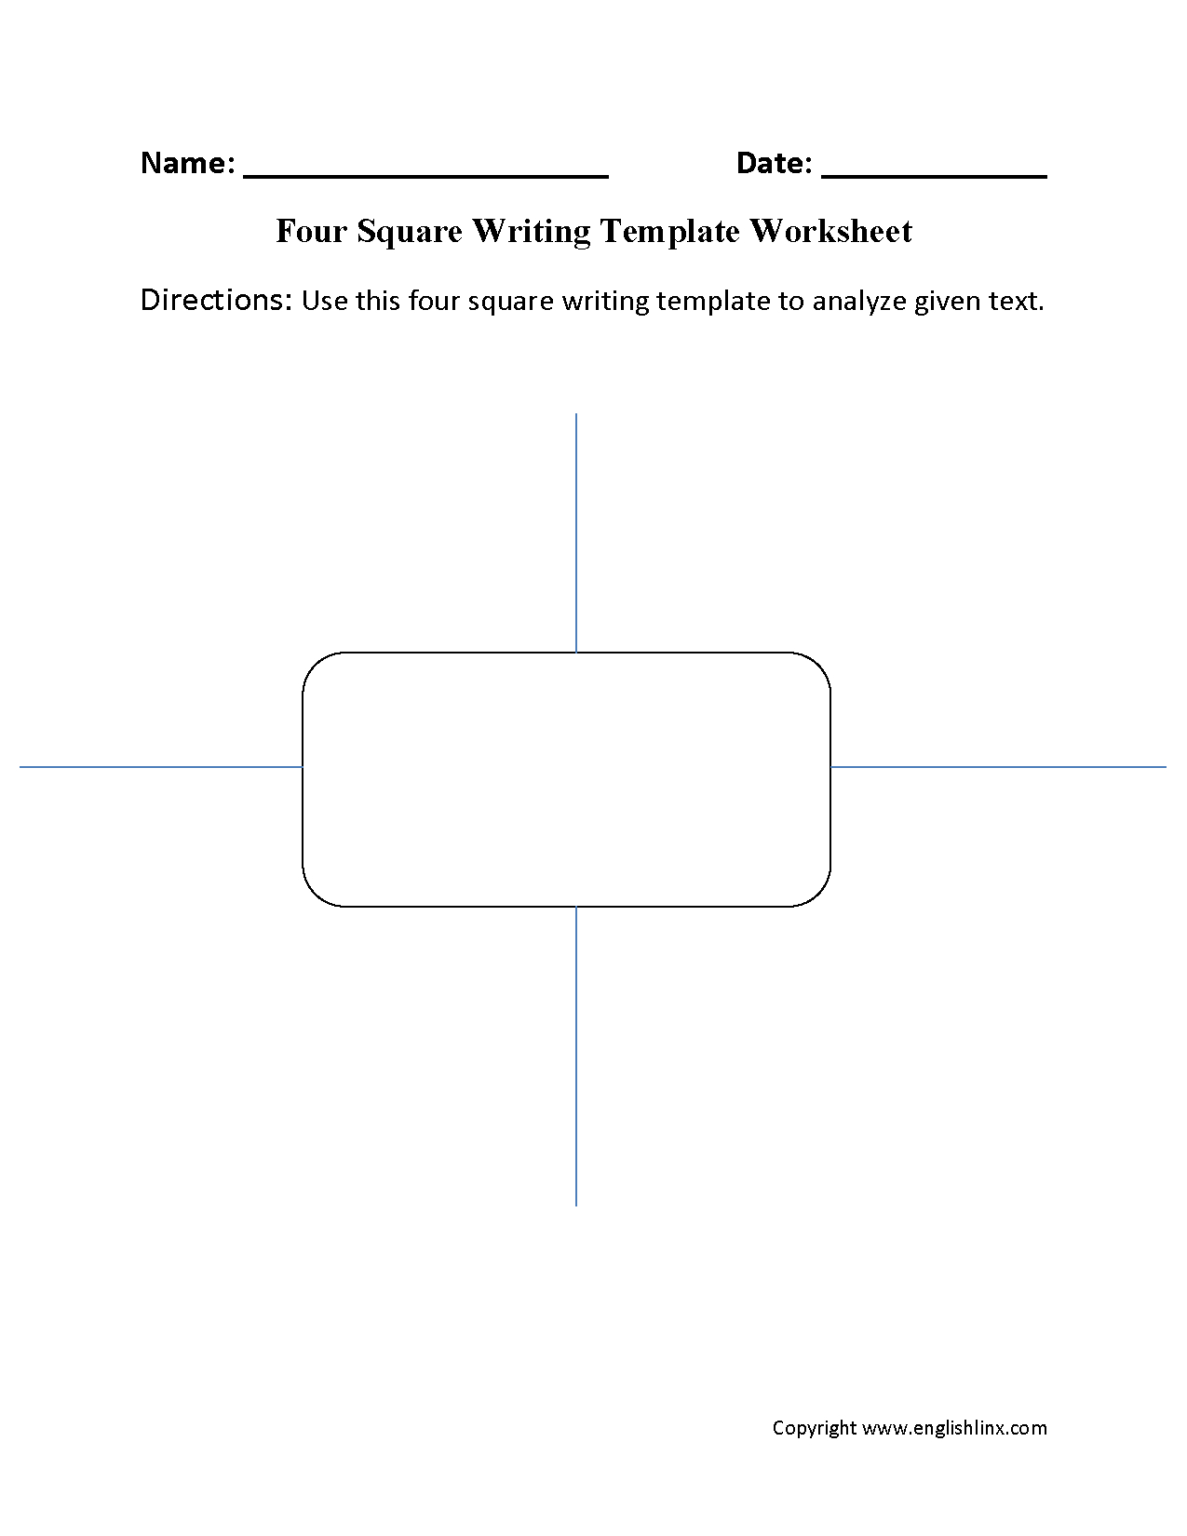 Writing Worksheets Writing Template Worksheets Inside Blank Four Square Writing Template Four Square Writing Writing Templates Writing Worksheets [ 1536 x 1187 Pixel ]